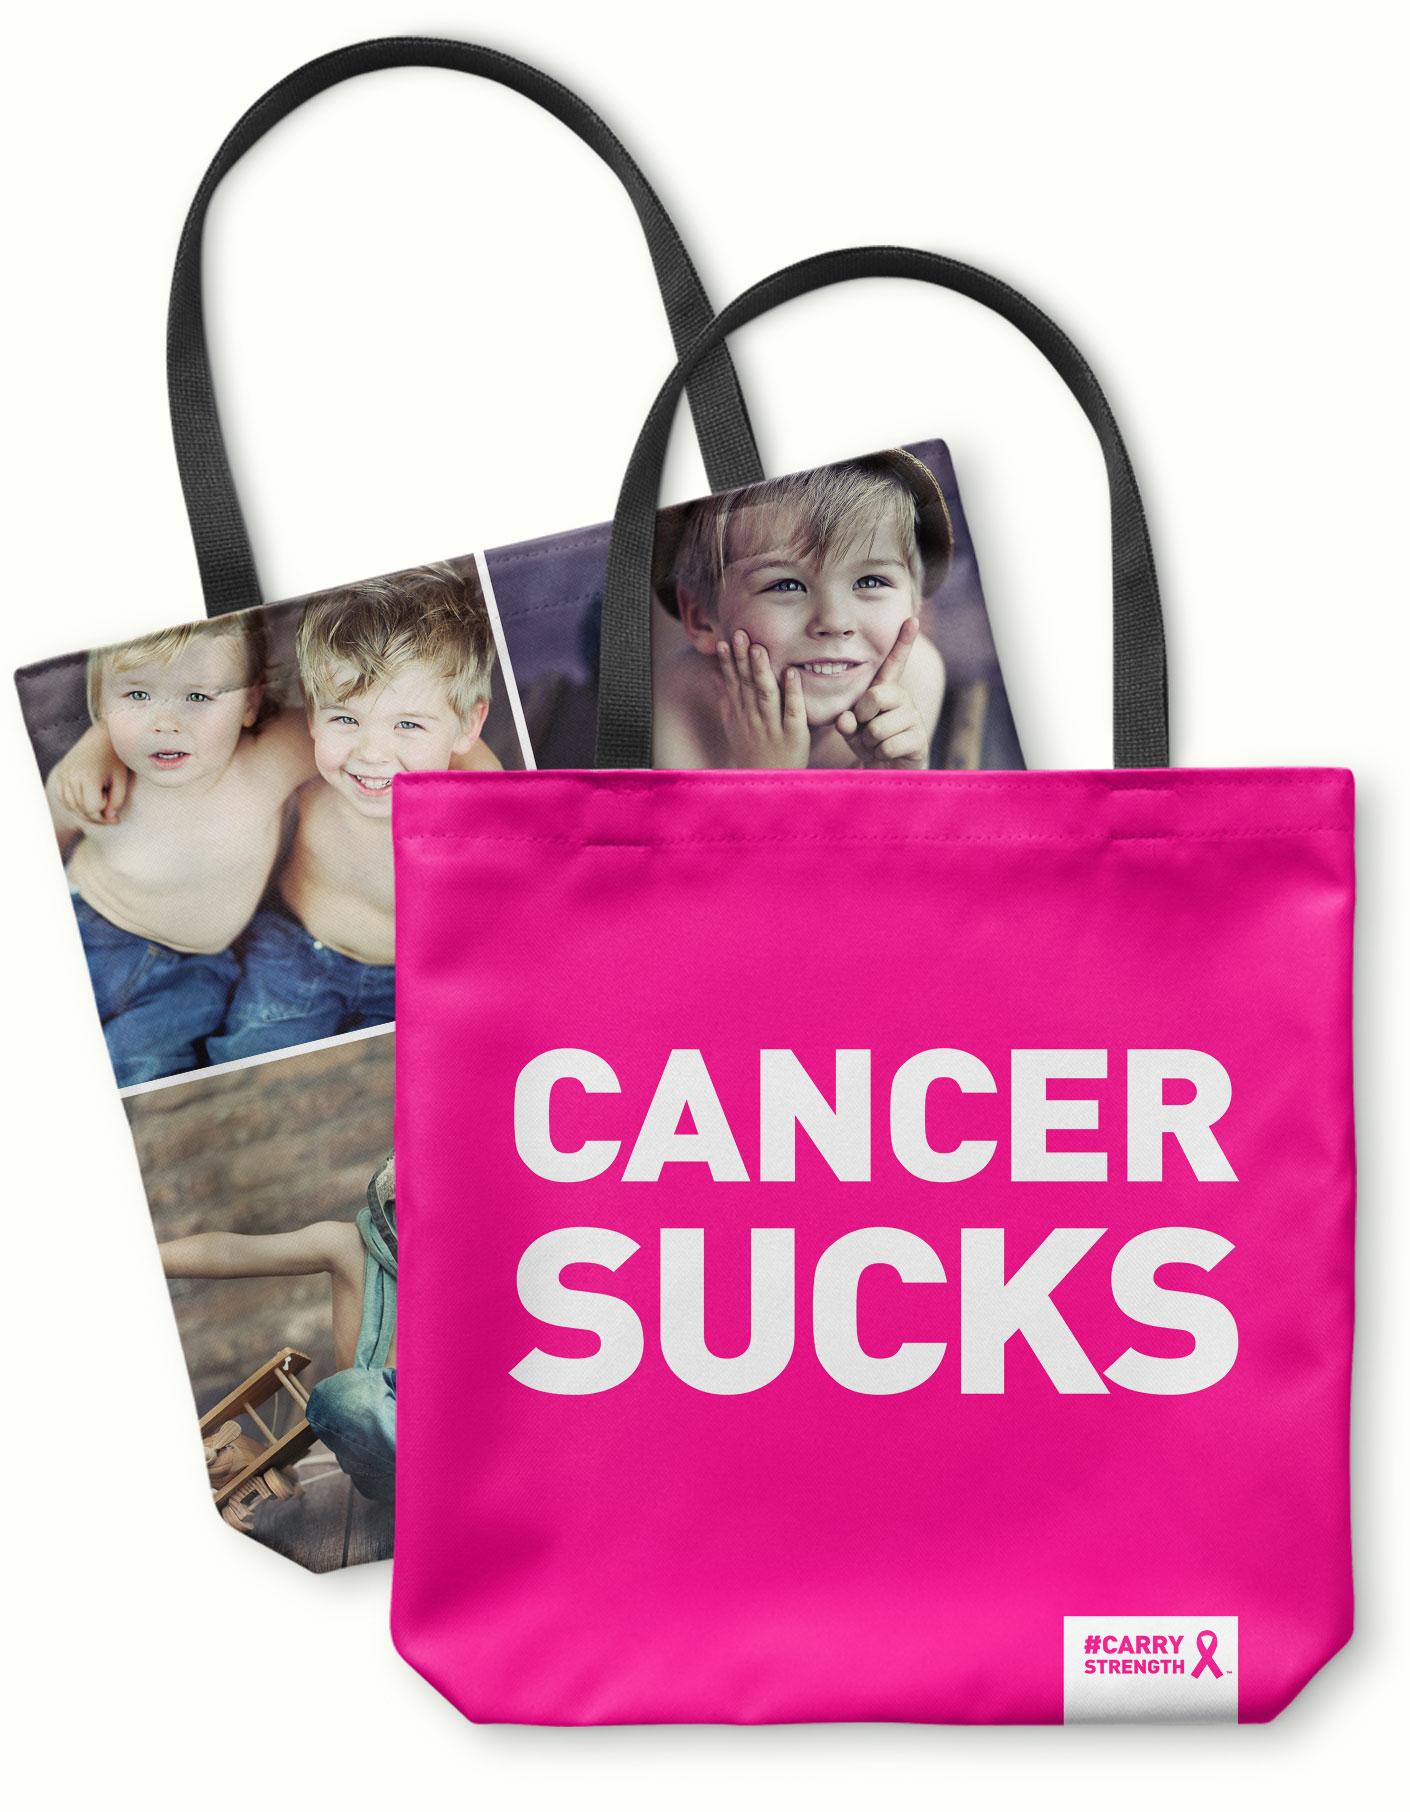 Cancer Sucks! Photo Tote Bag